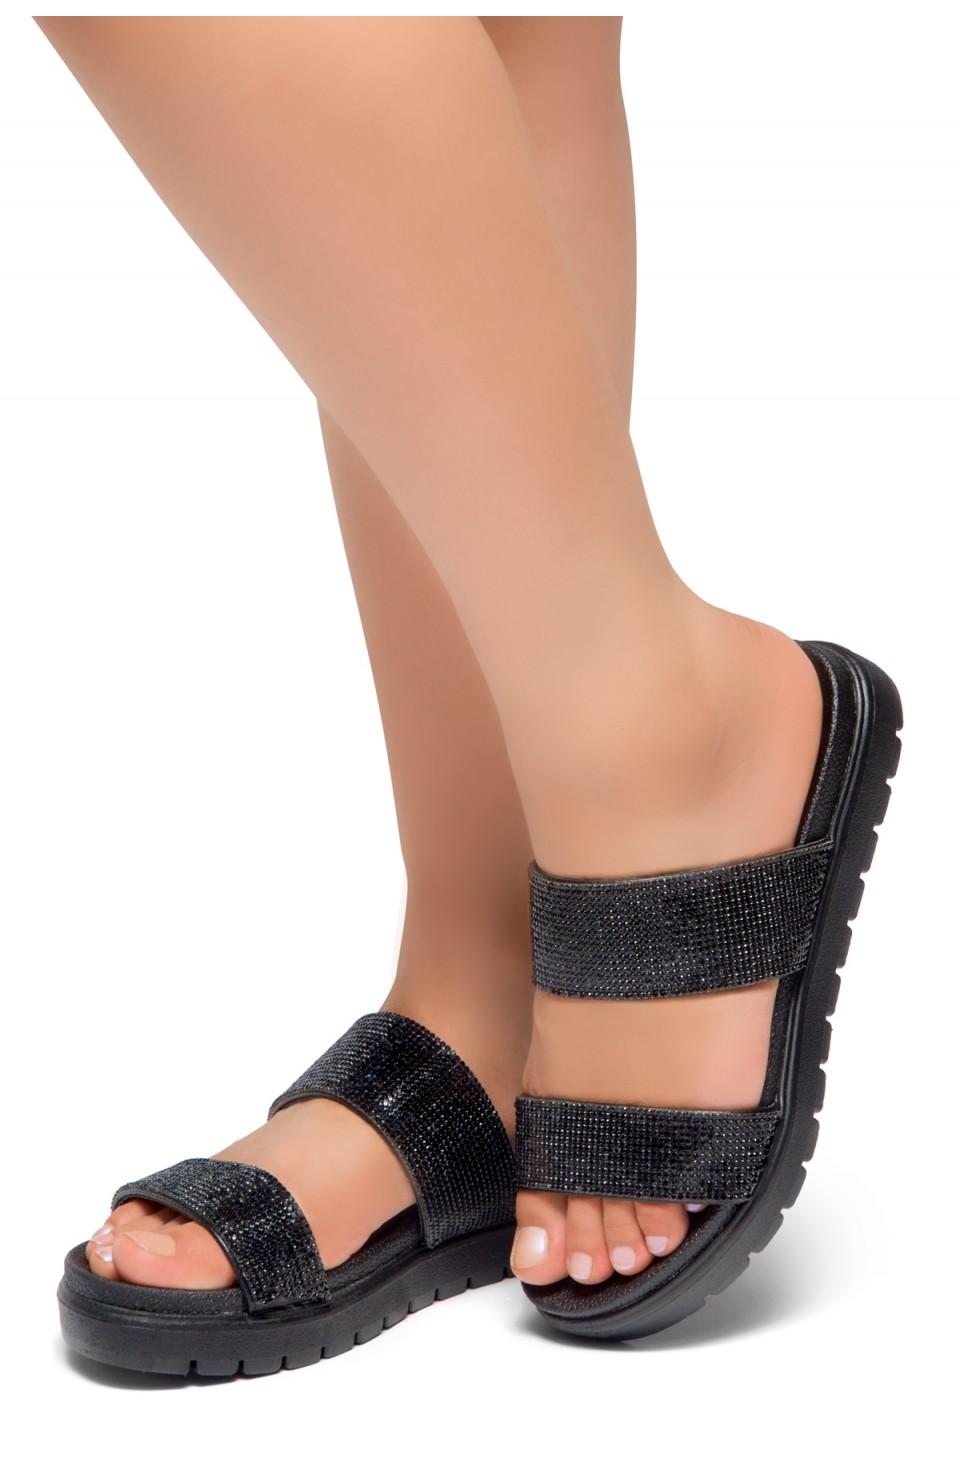 HerStyle Knock-Open Toe Jewelled Embellishment Slide Sandal (Black)